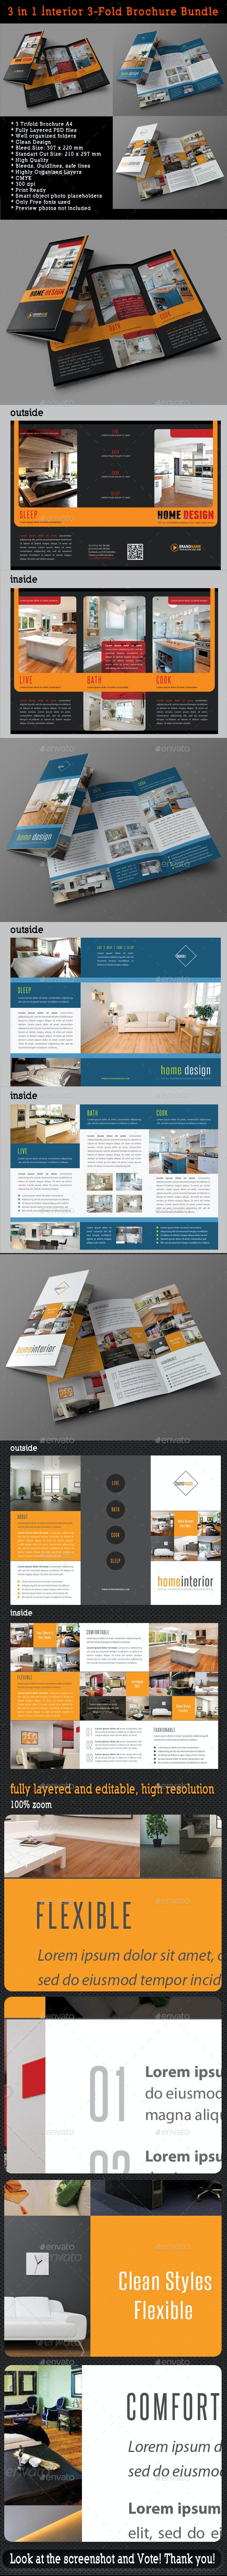 3 in 1 Interior 3-Fold Brochure Bundle 04 - Corporate Brochures